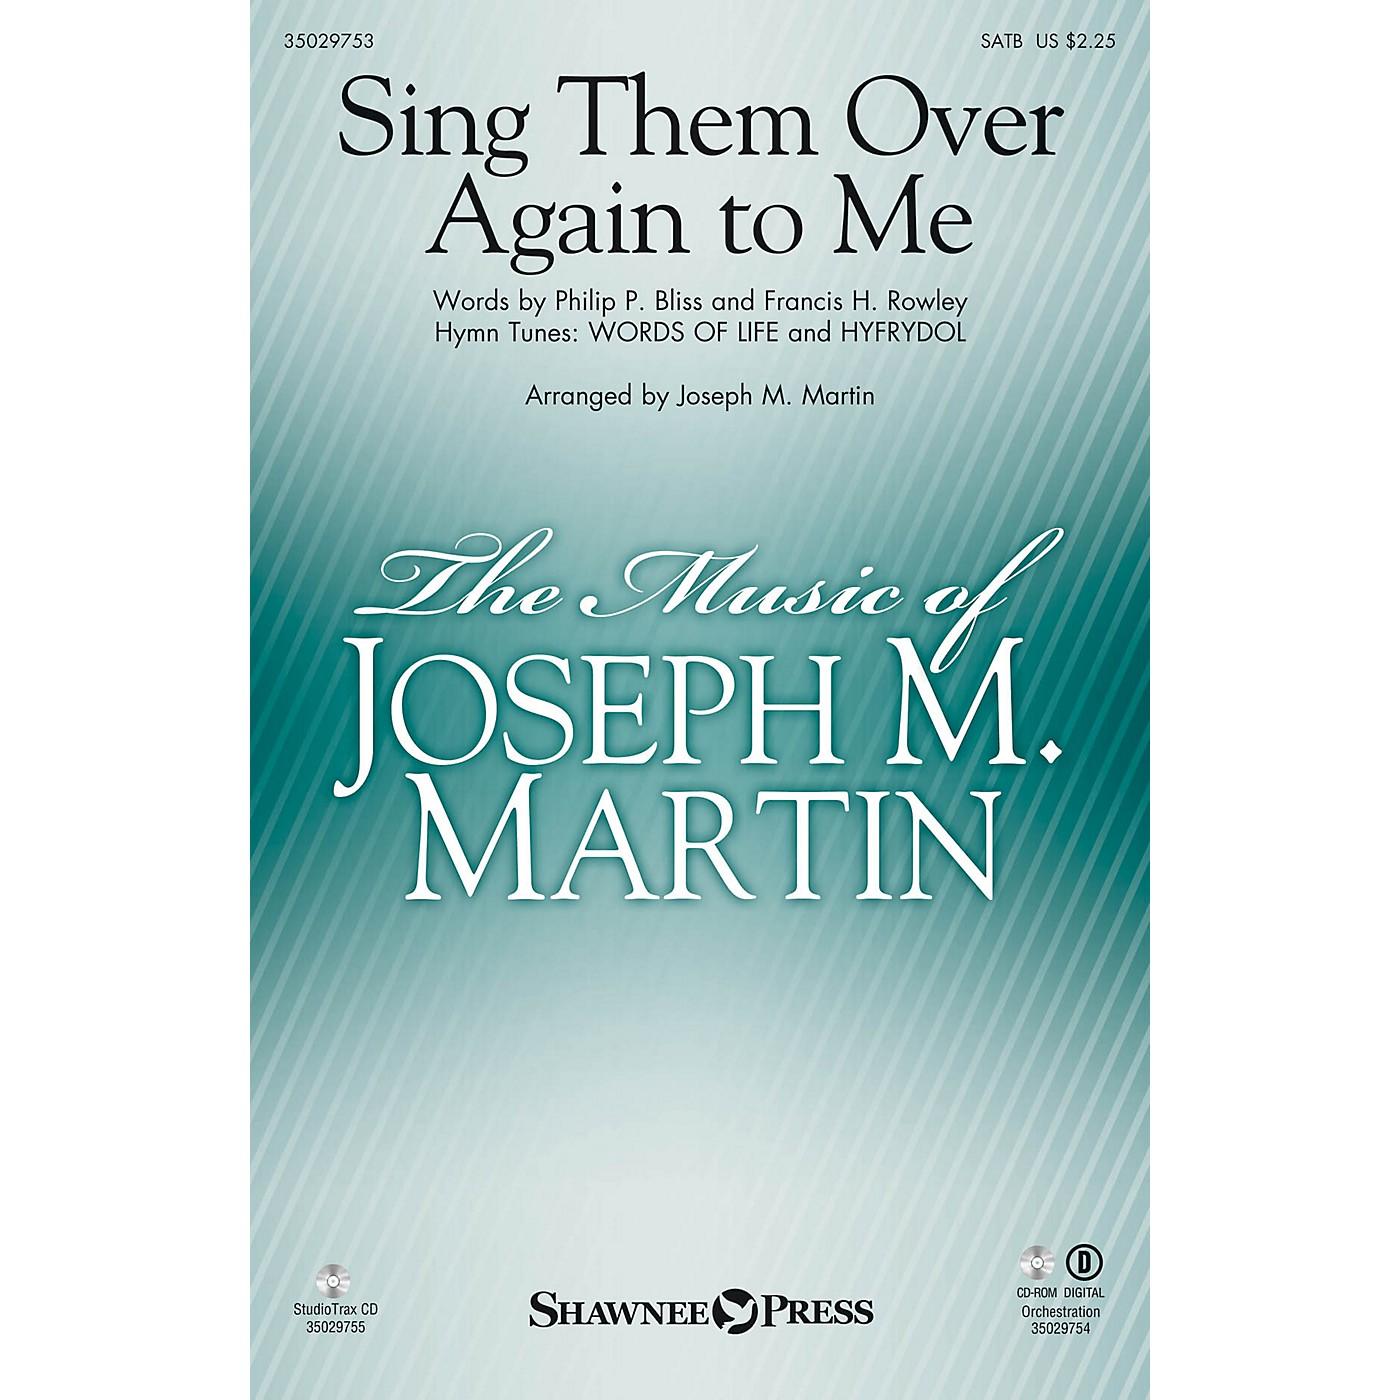 Shawnee Press Sing Them Over Again to Me Studiotrax CD Arranged by Joseph M. Martin thumbnail